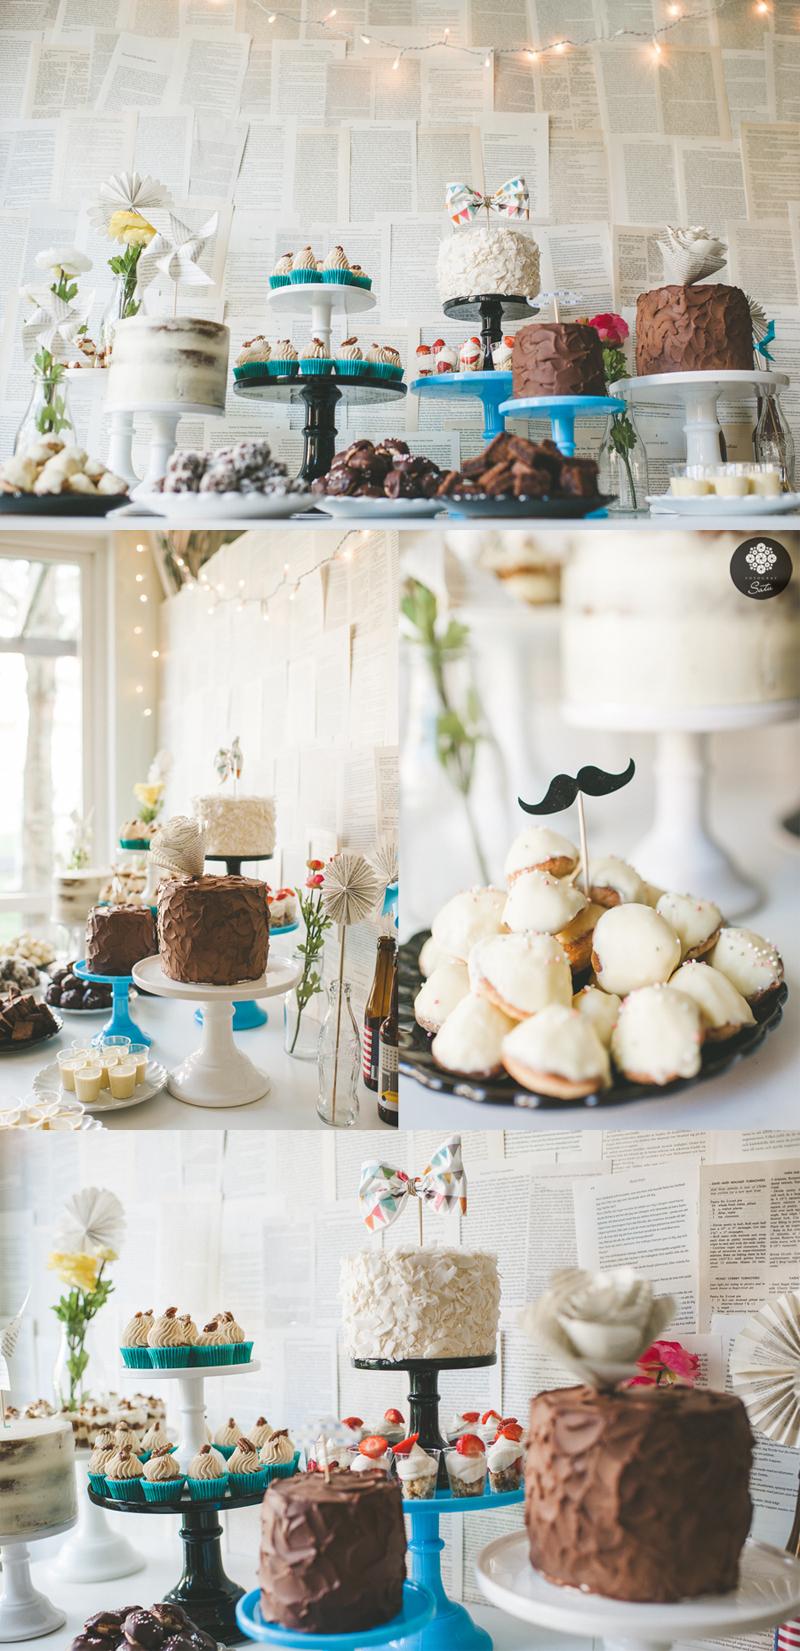 dessertbord 3